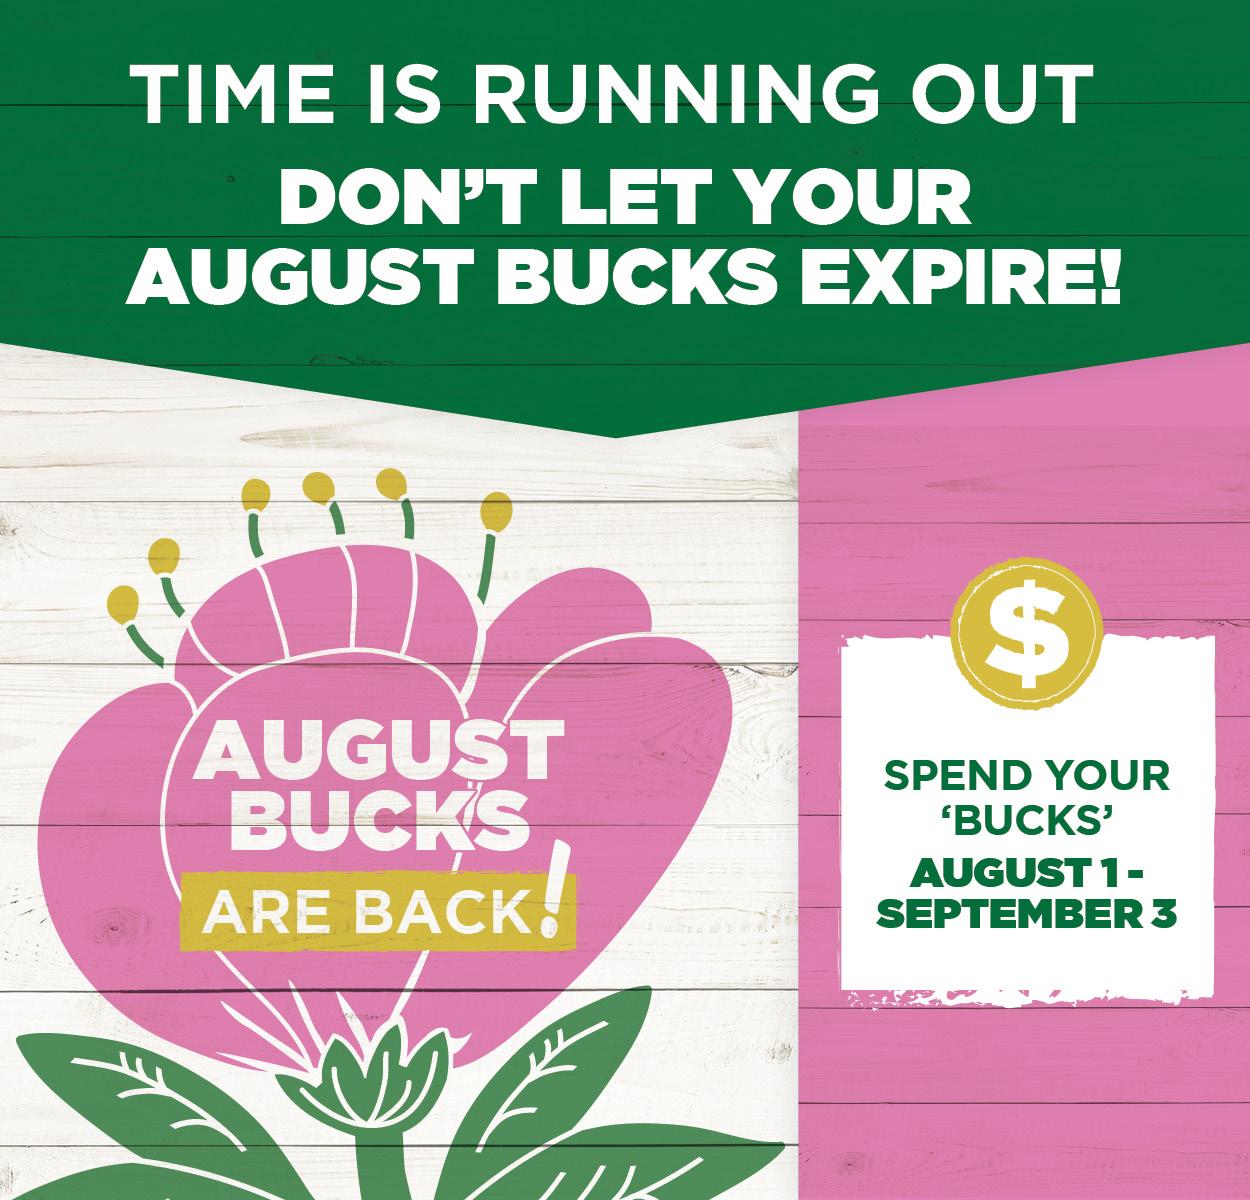 August Bucks